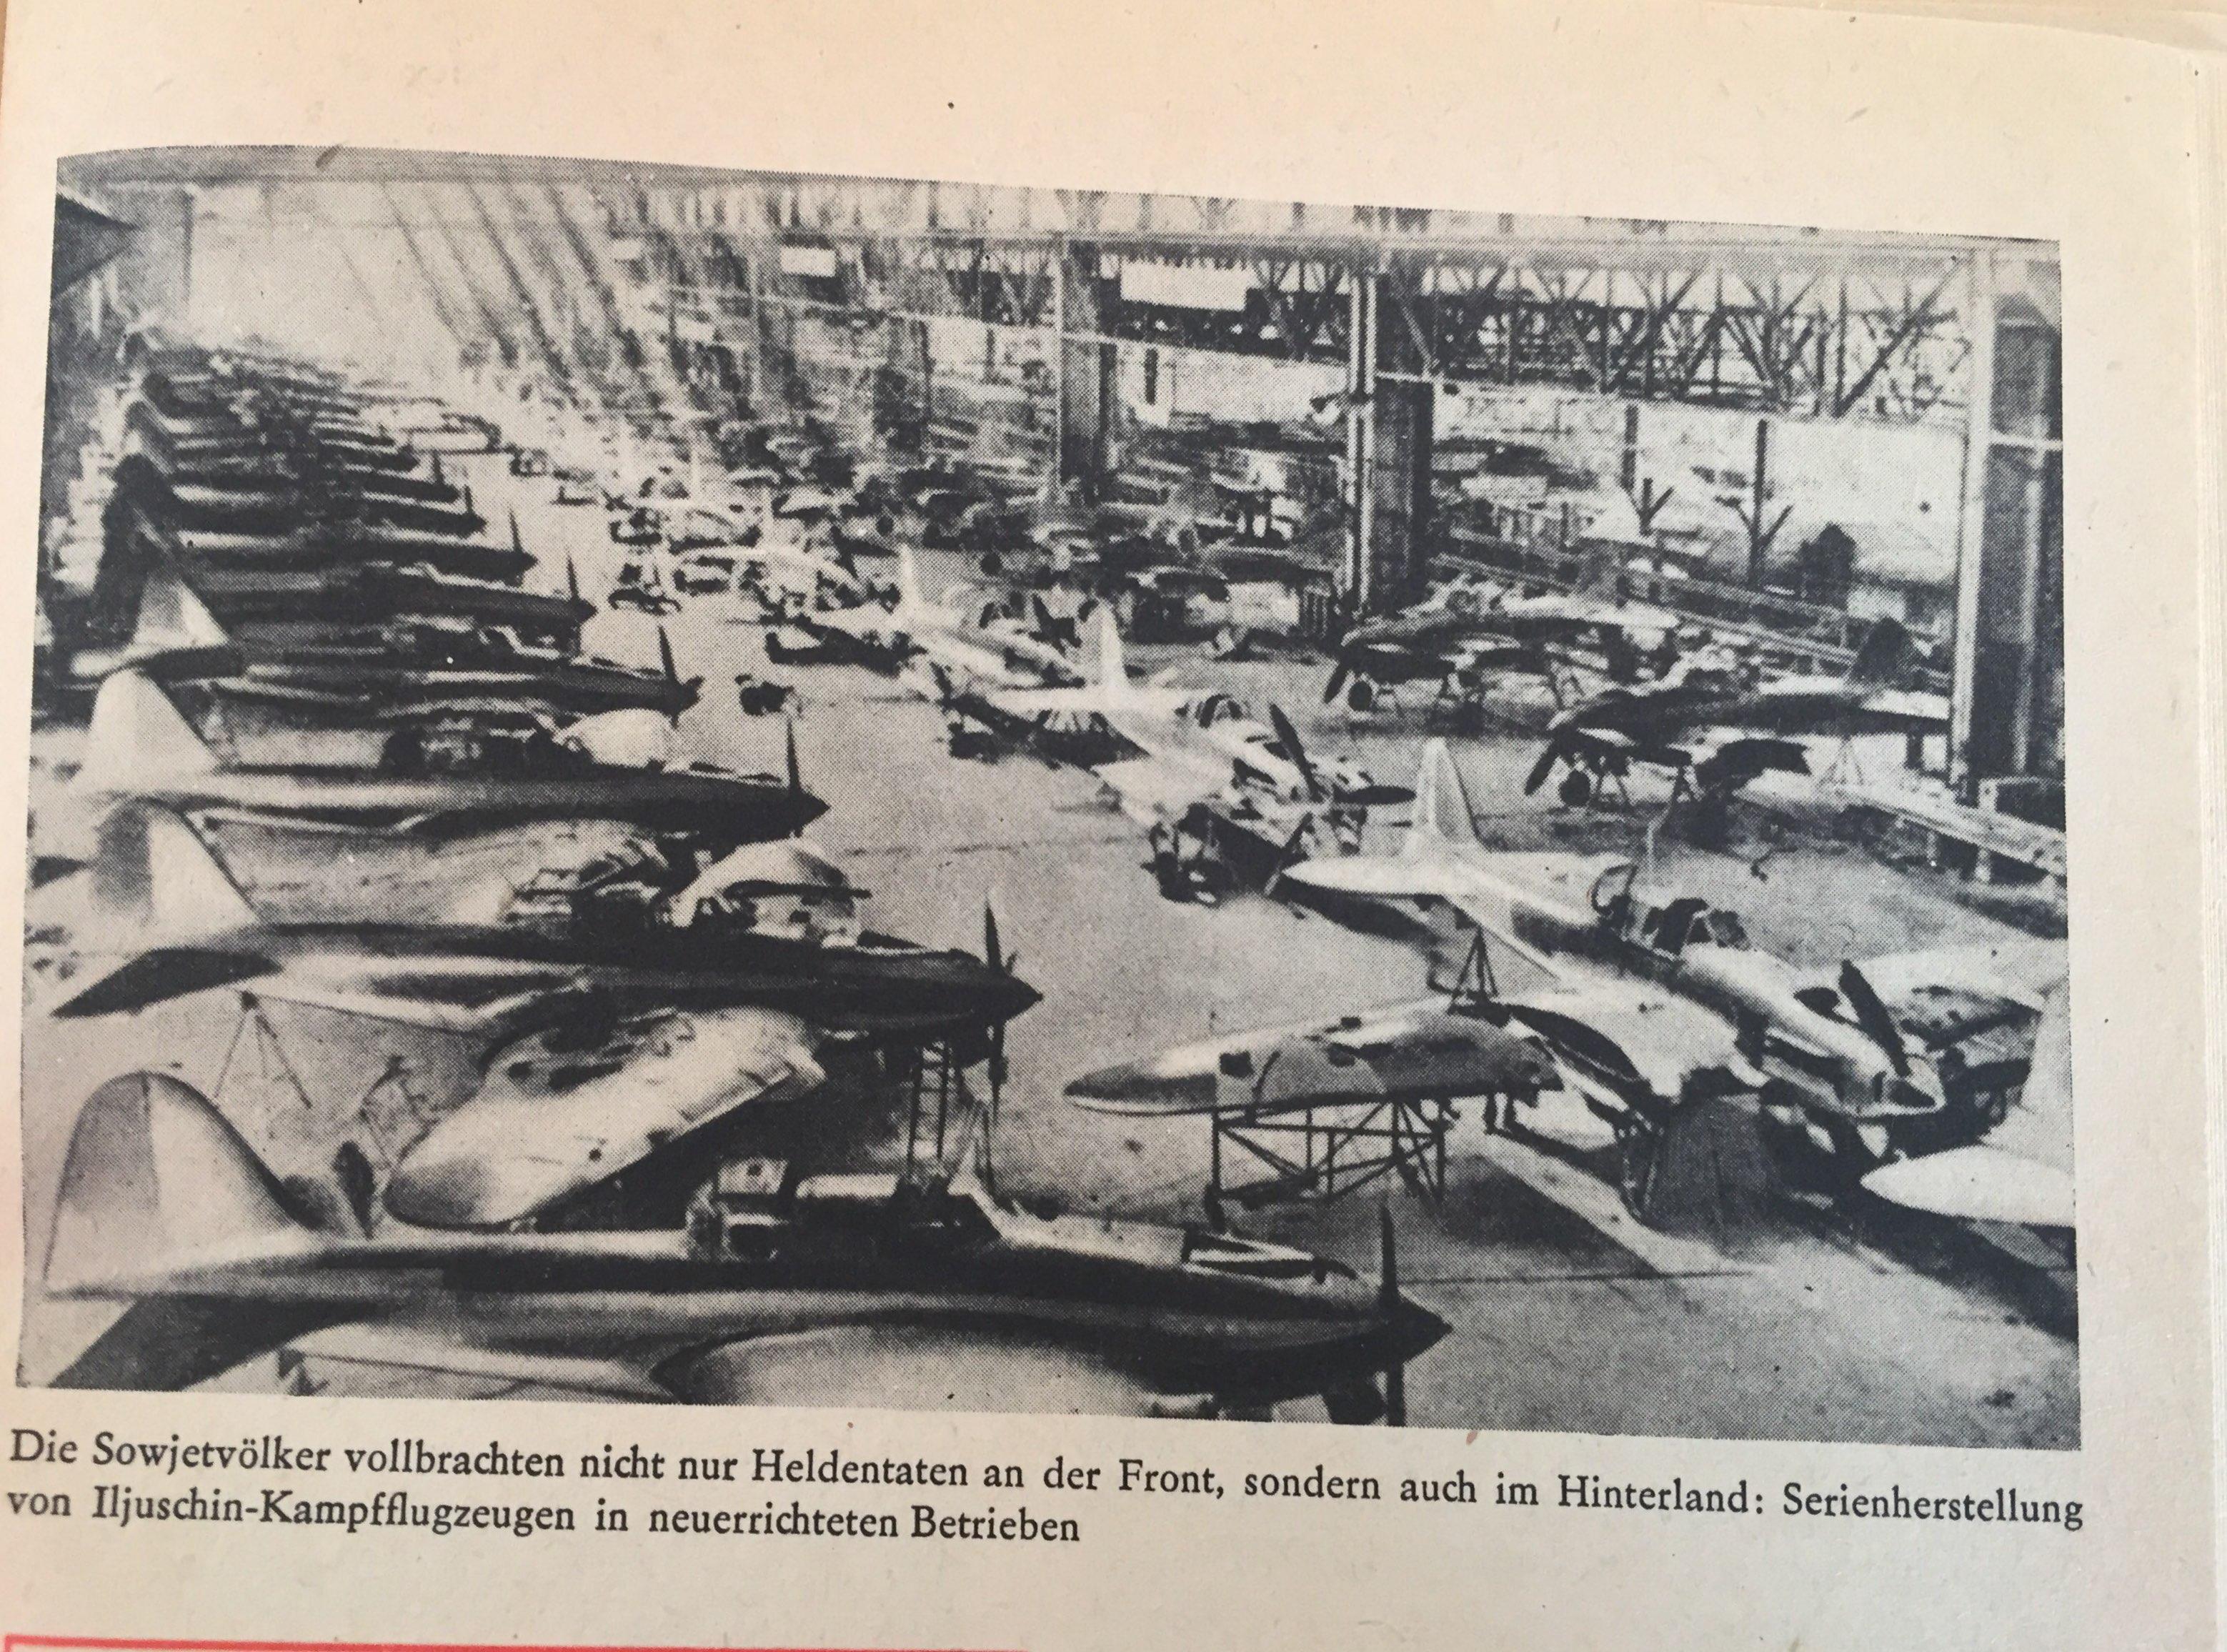 Flugzeugfabrik SU